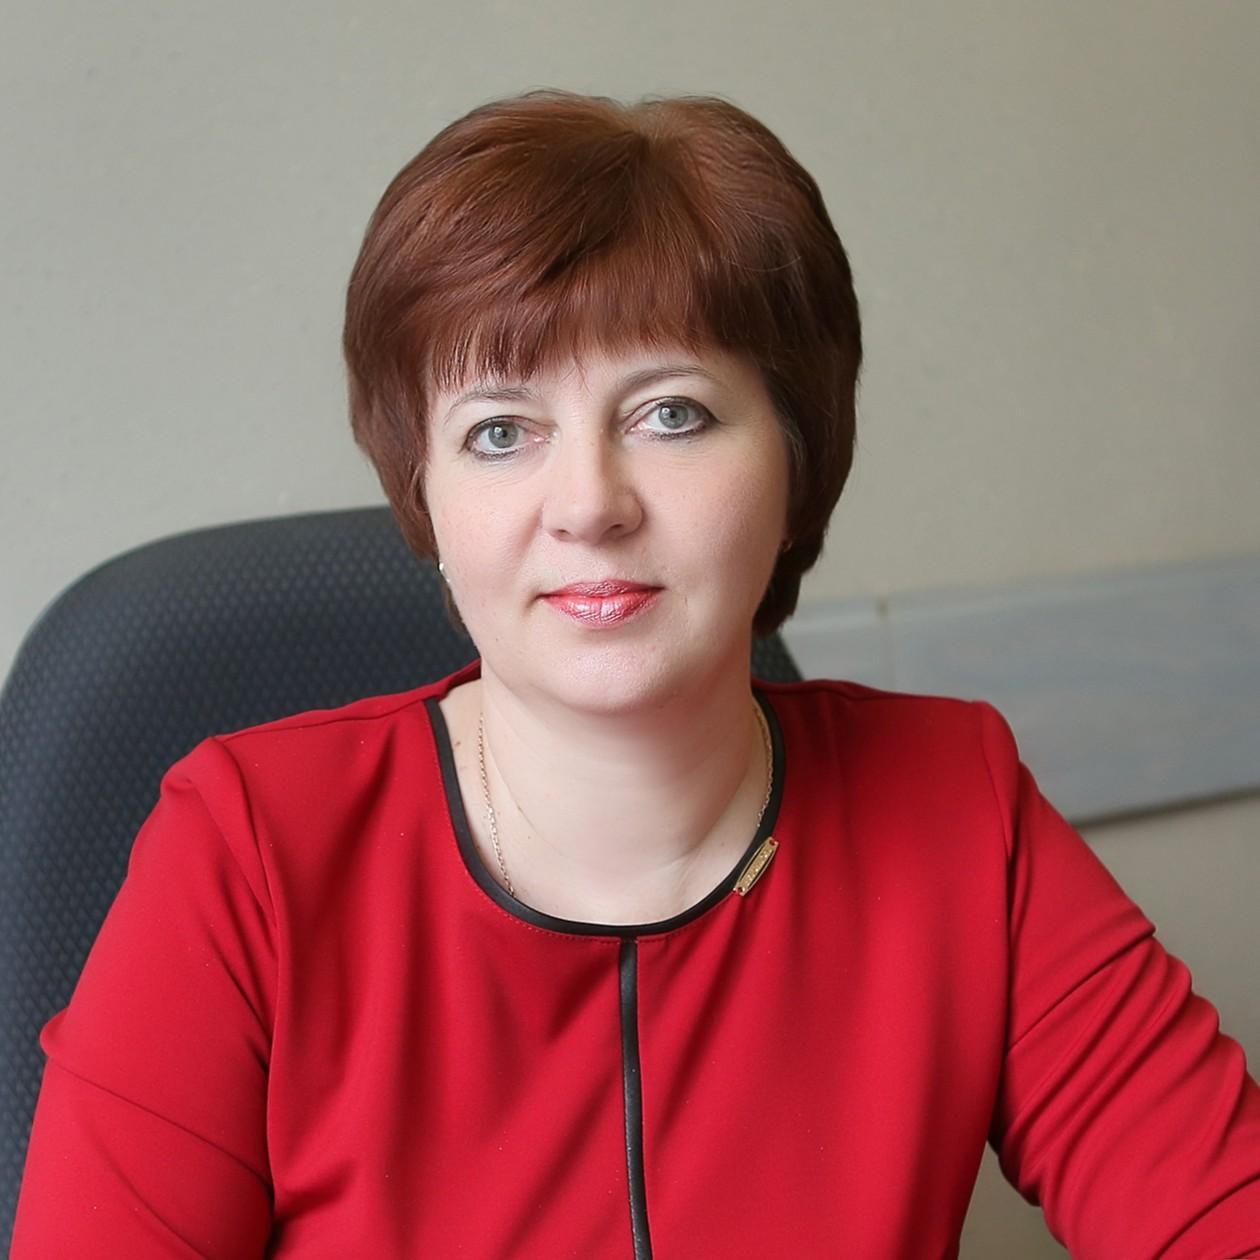 Наталья Васильевна Ахромеева